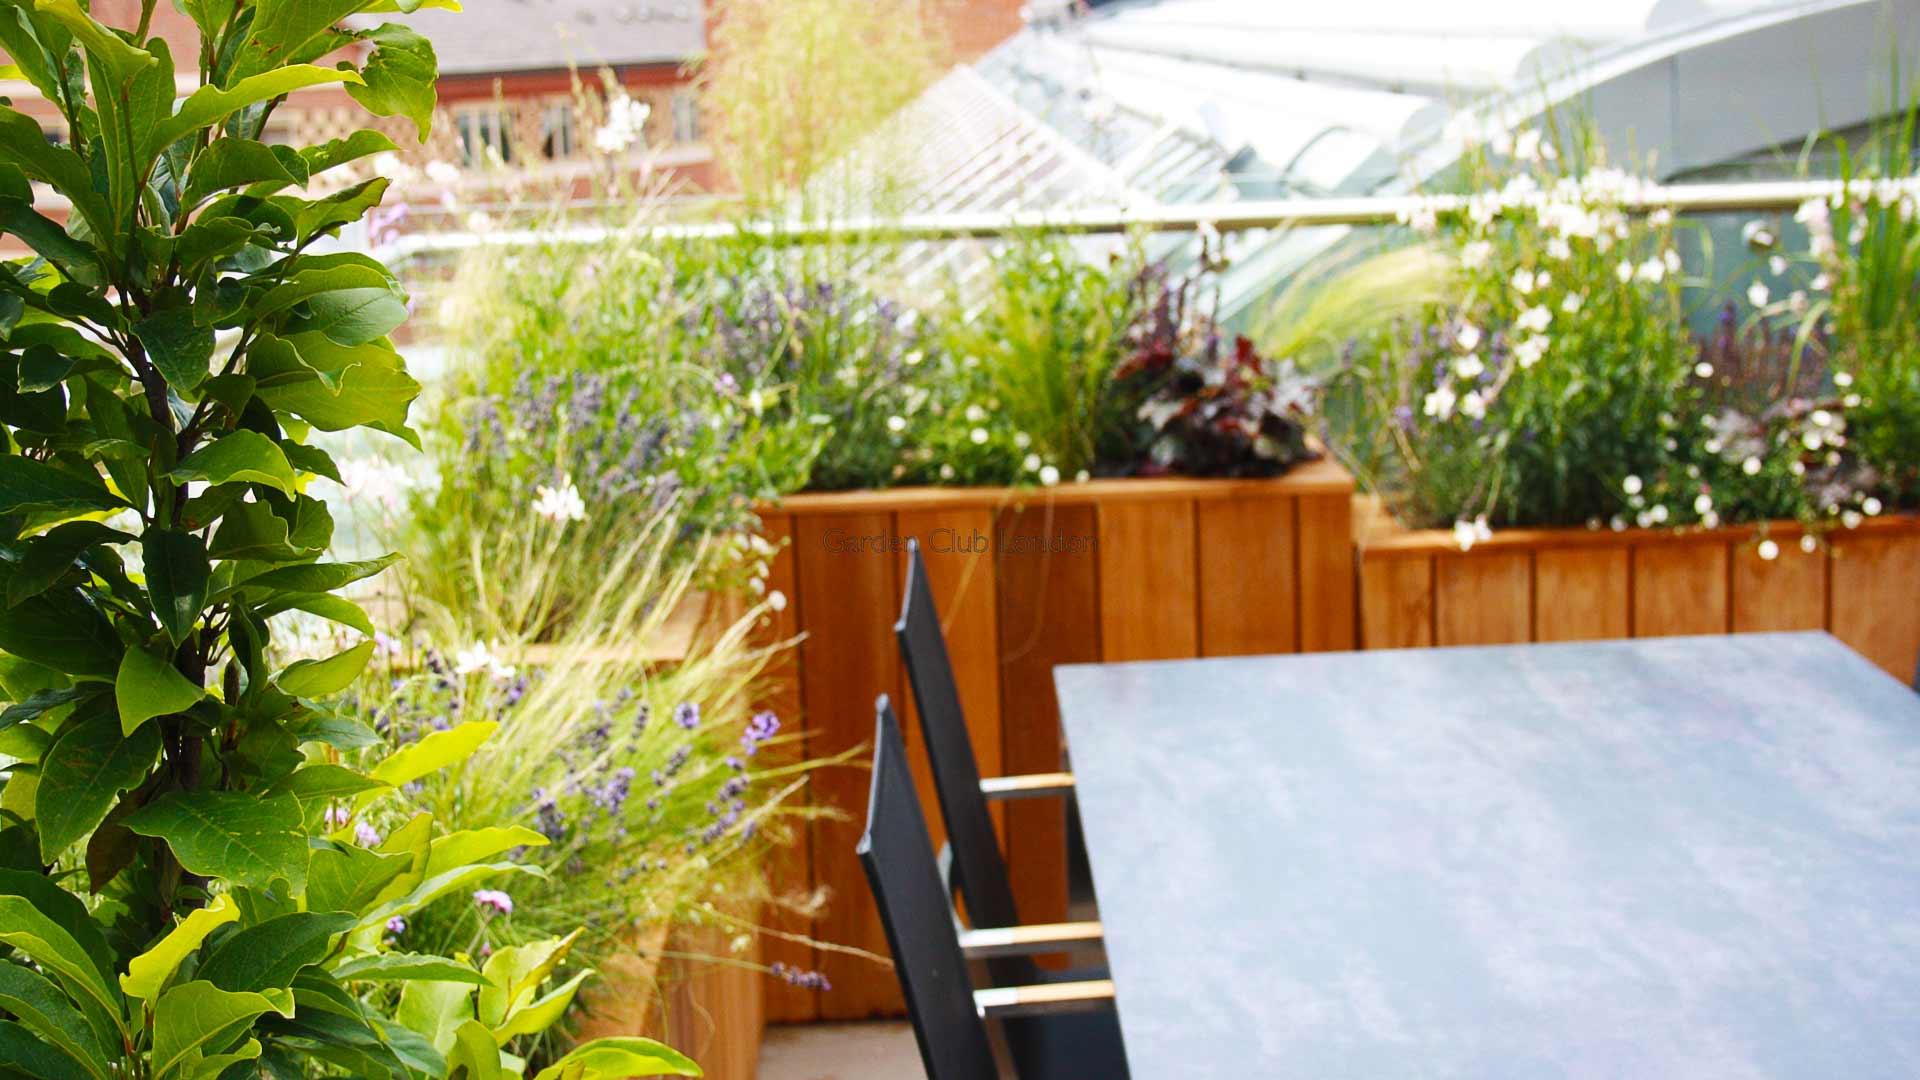 urban garden roof design garden club london. Black Bedroom Furniture Sets. Home Design Ideas